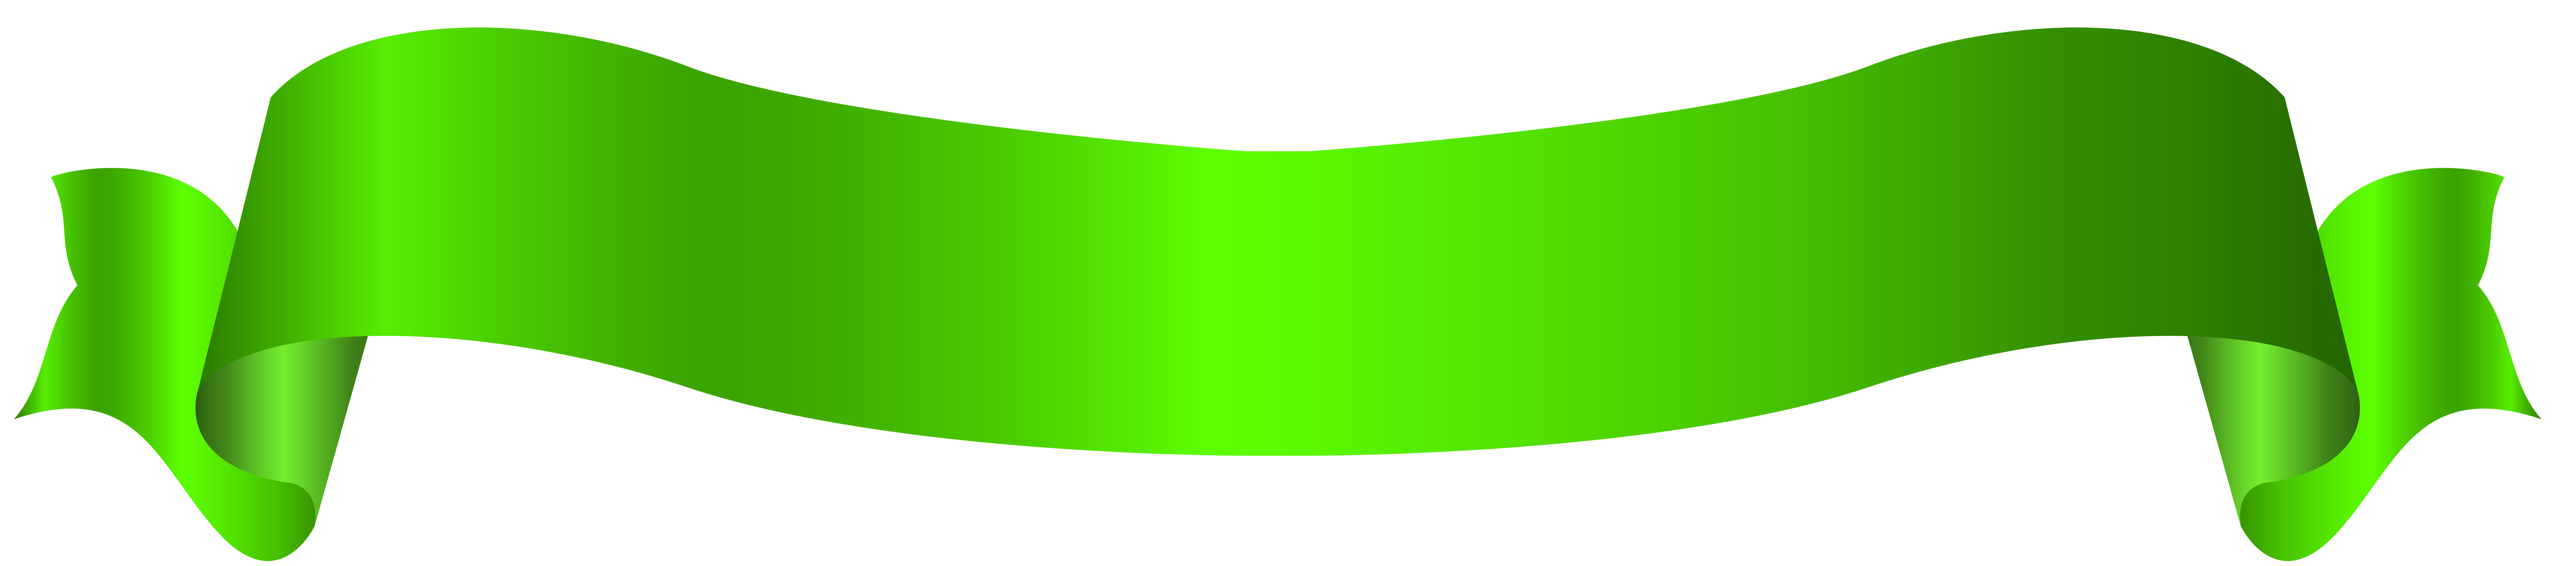 Long green png transparent. Clipart banner yellow ribbon